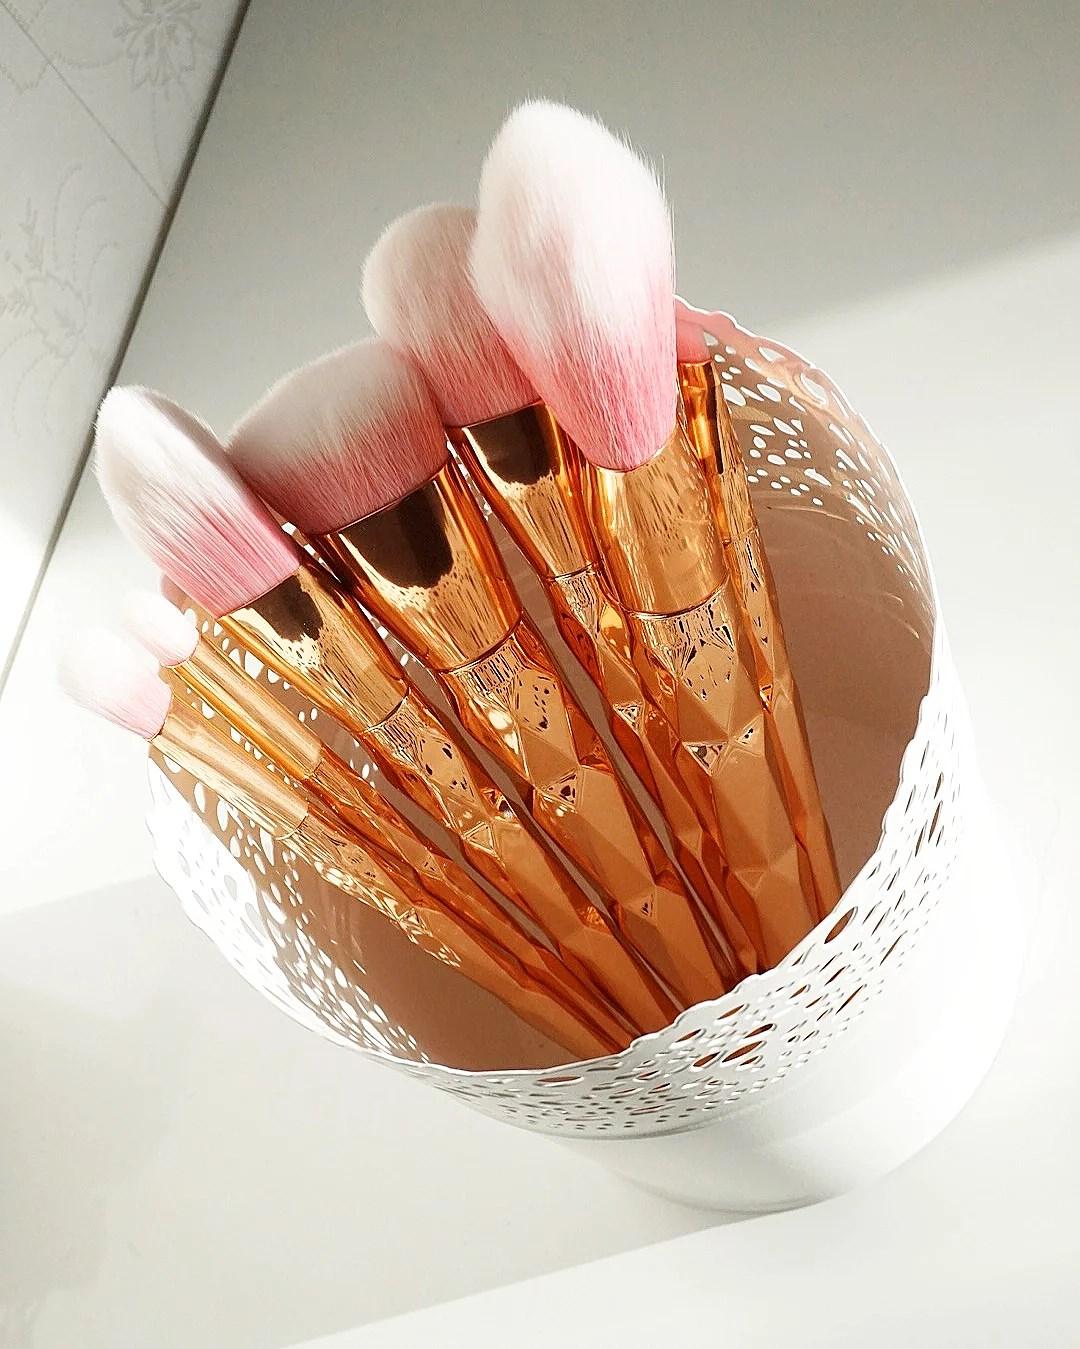 ROSÉ GOLD MAKEUPBRUSHES